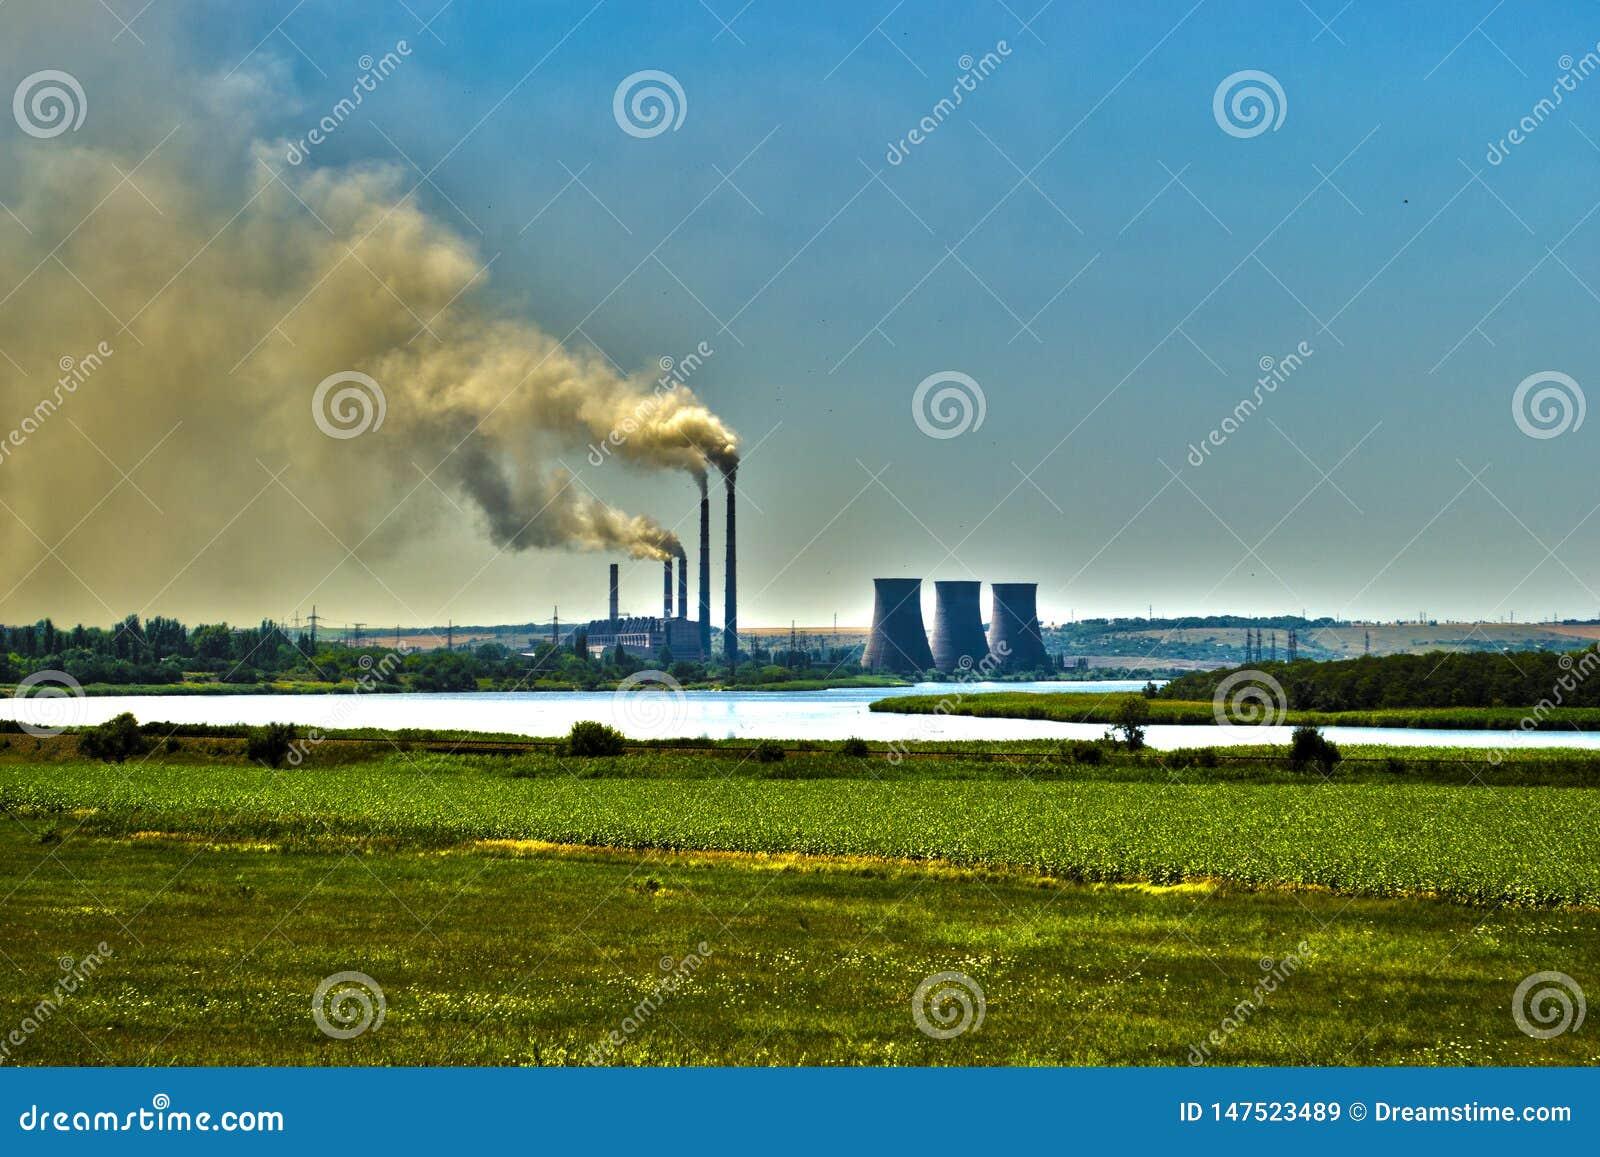 Energie gegen Luftverschmutzung